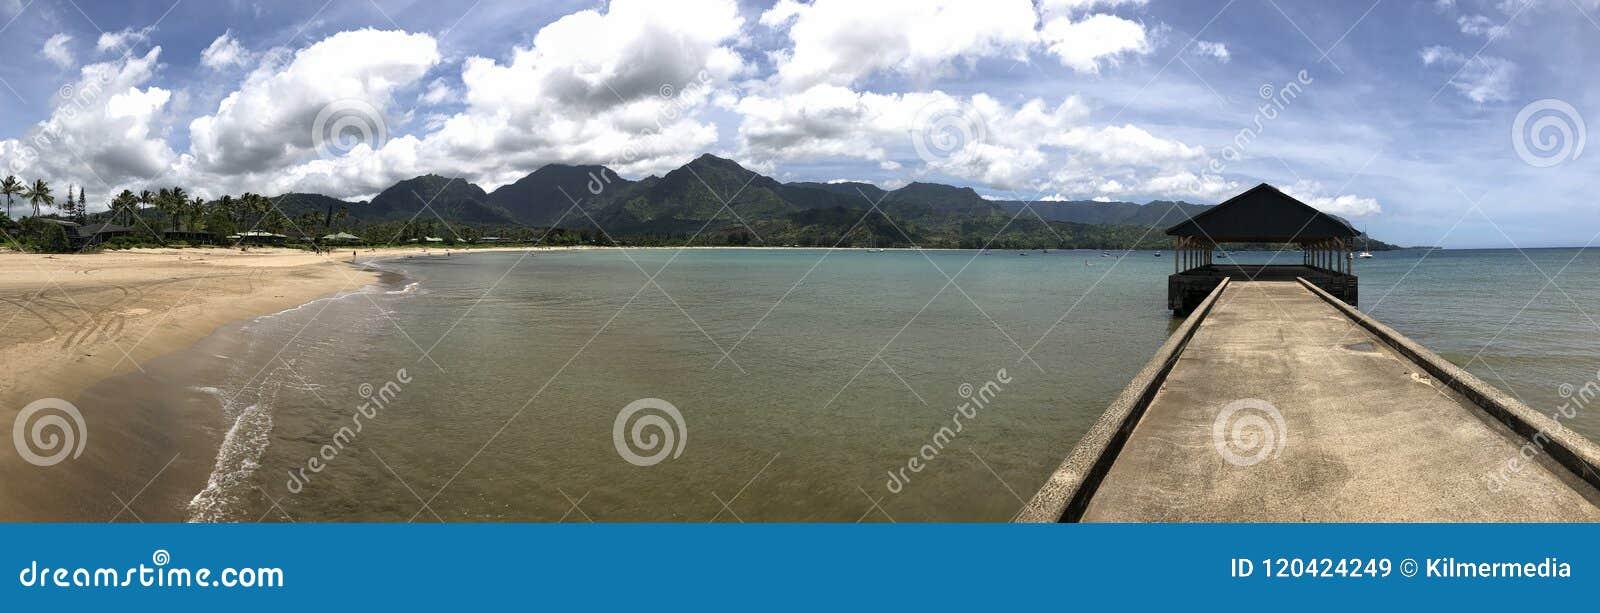 Panoramamening met groot scherm van Hanalei-Pijler en Baai, Kauai, Hawaï,